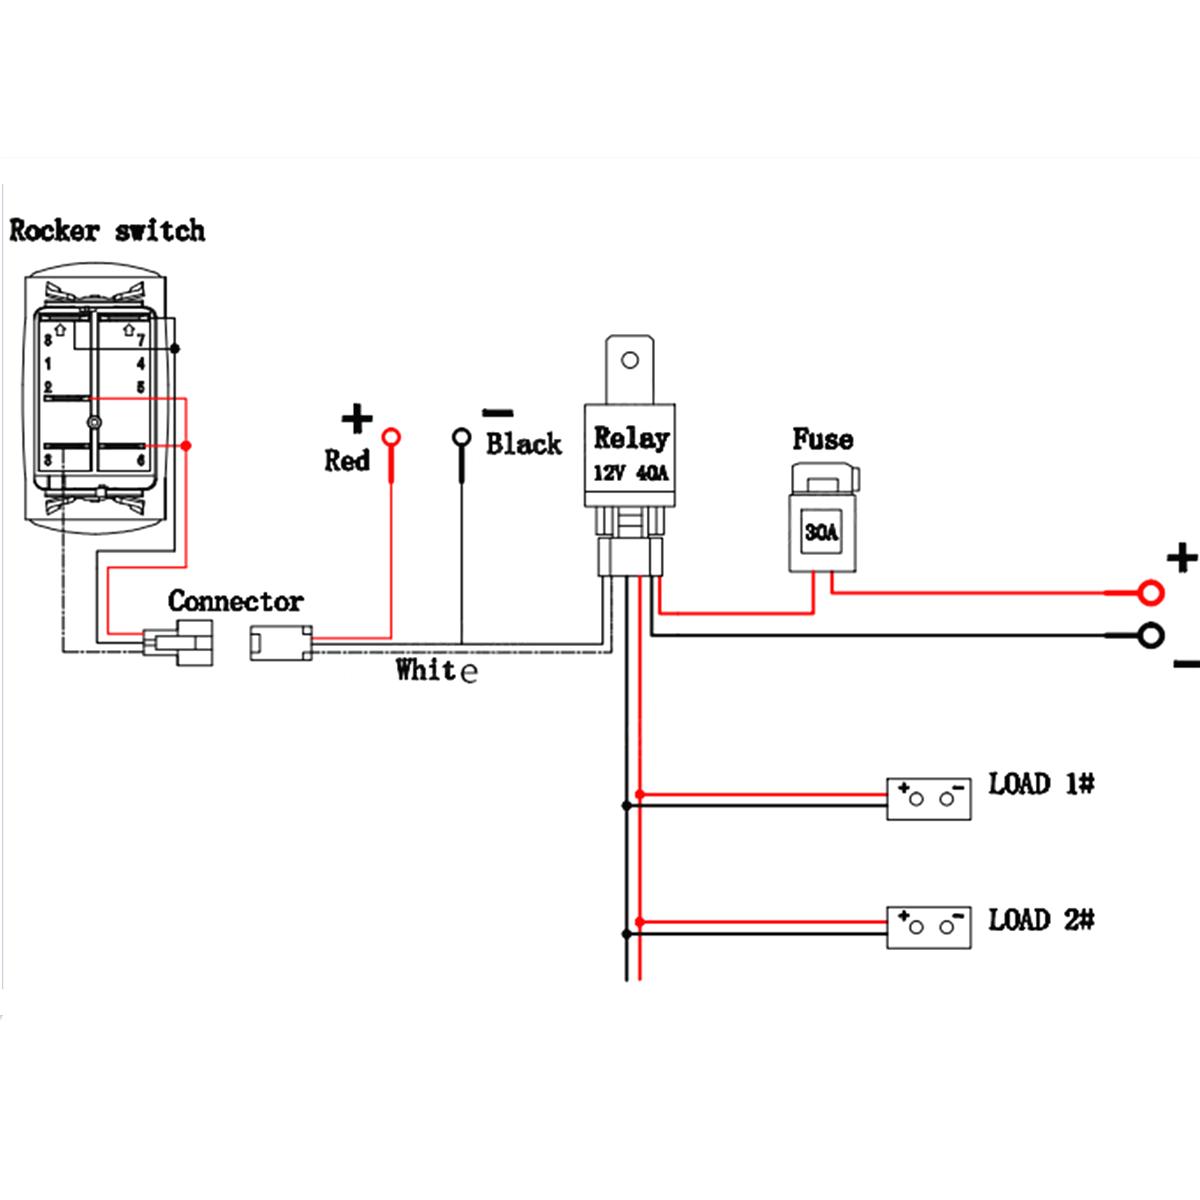 12v 40a led fog light wiring harness laser rocker switch relay picturesque led diagram [ 1200 x 1200 Pixel ]